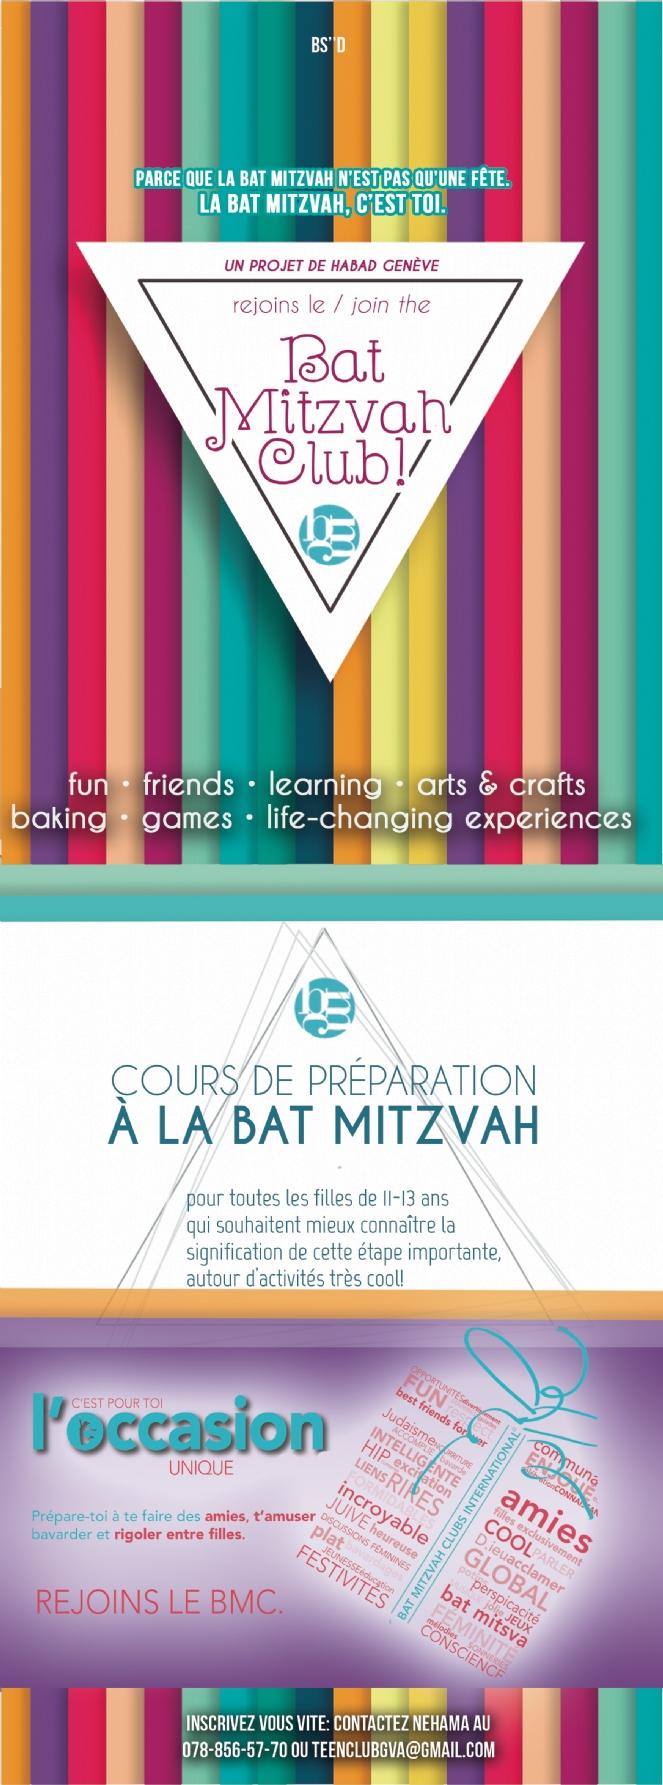 REJOINS LE BAT MITZVAH CLUB!.jpg